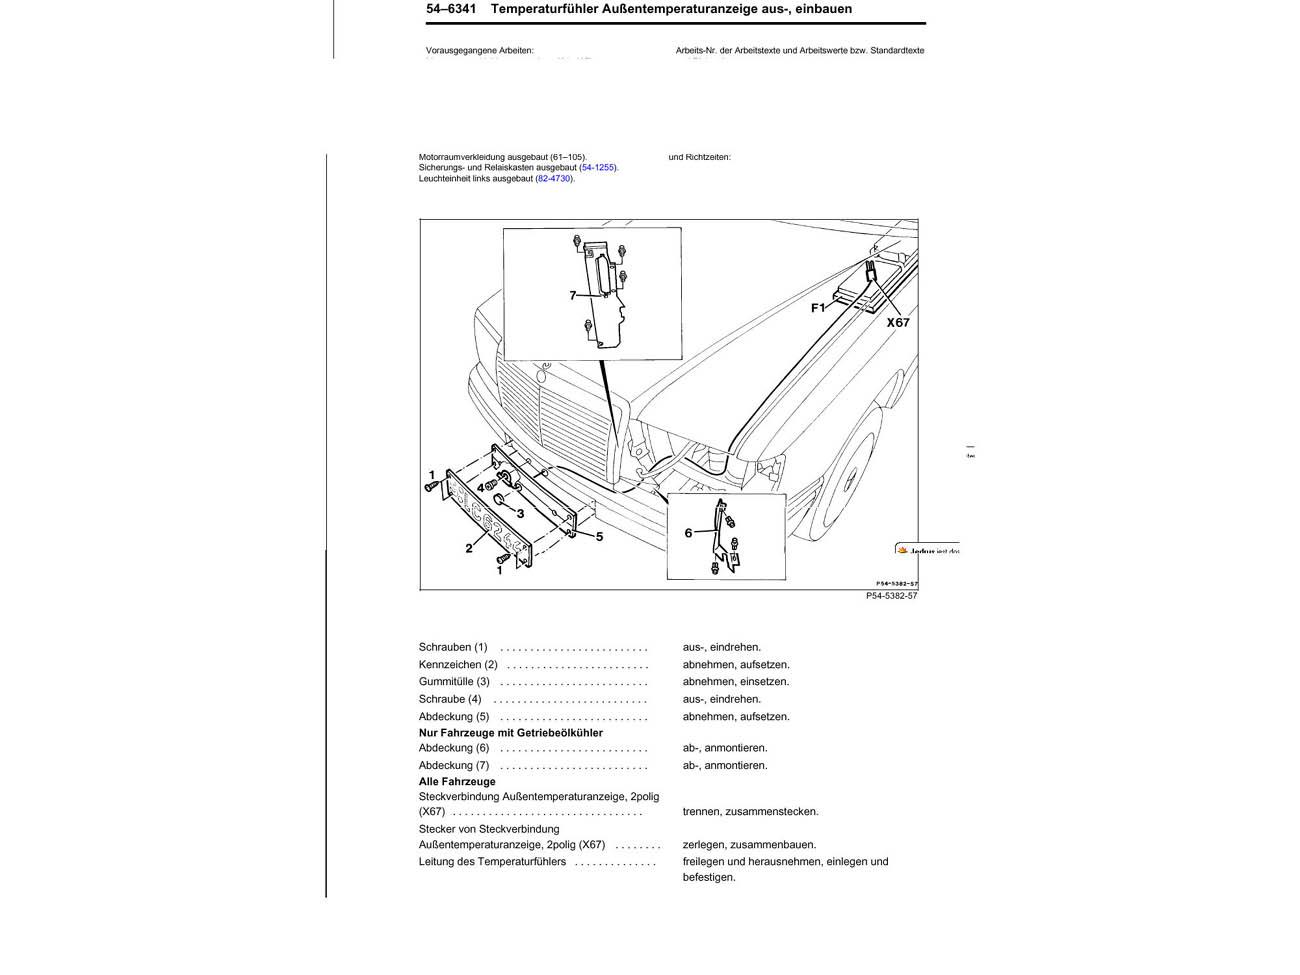 Erfreut Audi A6 Temp Sensor Schaltplan Bilder - Elektrische ...